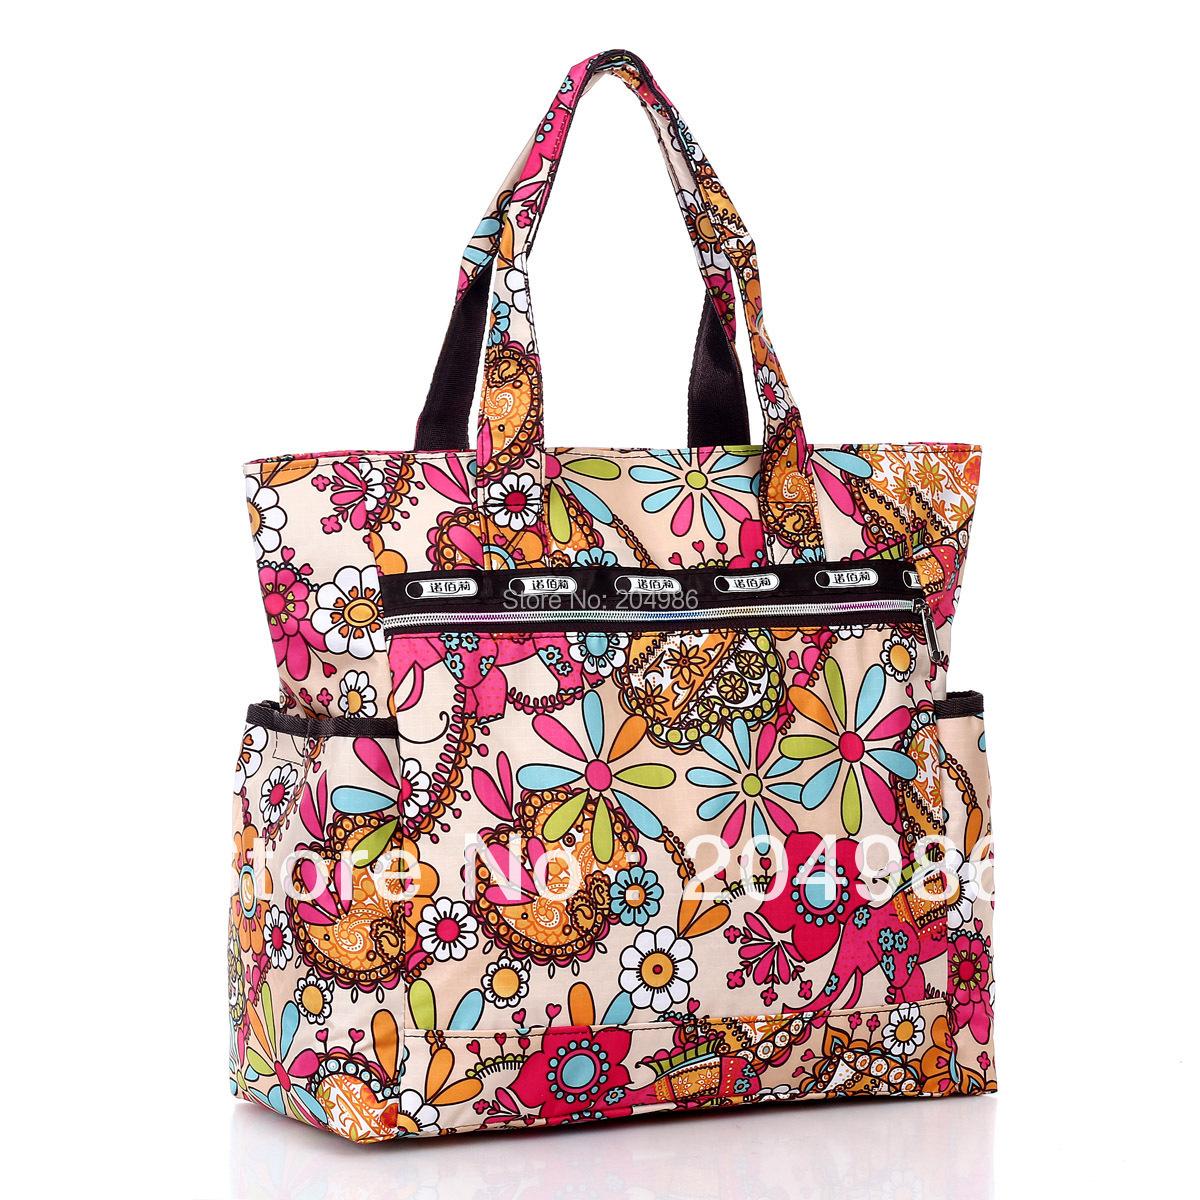 Flower Waterproof Nylon Plus Size Handbag Shoulder Bags Beach Bag Nappy Women Handbag New Arrival 2013 Free Shipping SM030(China (Mainland))